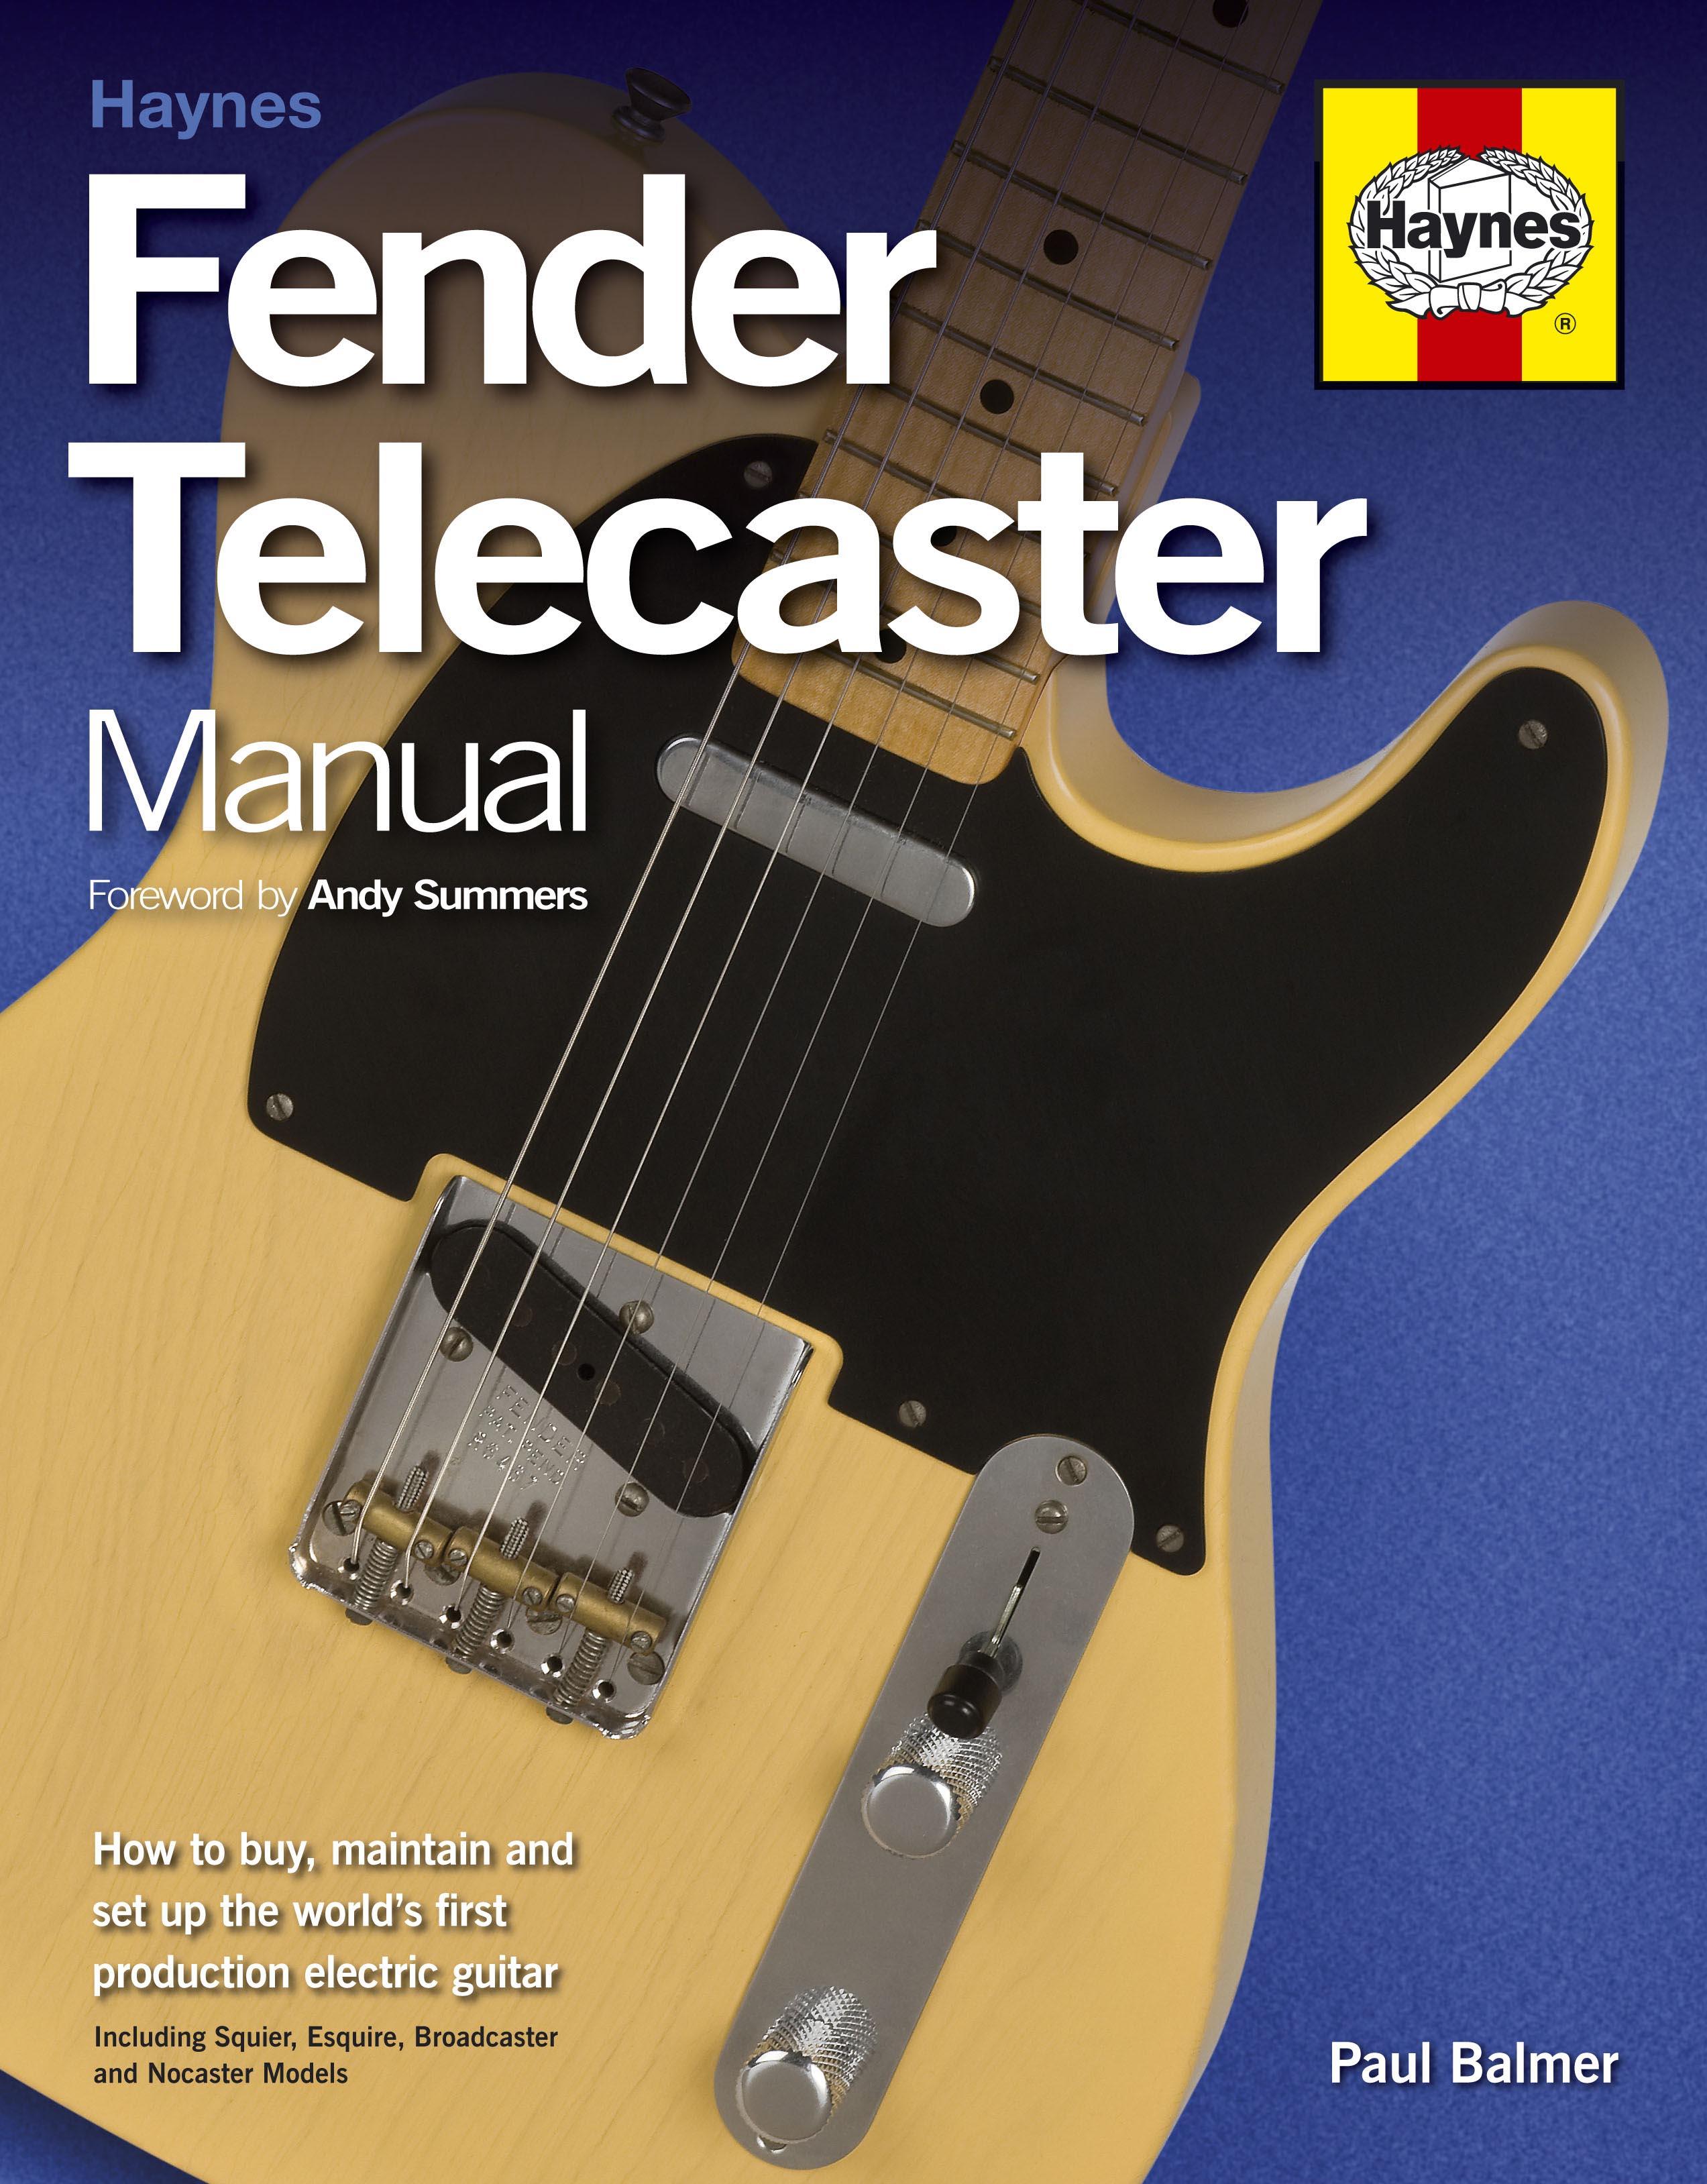 fender telecaster manual haynes publishing rh haynes com Fender Squier Stratocaster Squier by Fender Acoustic Guitar